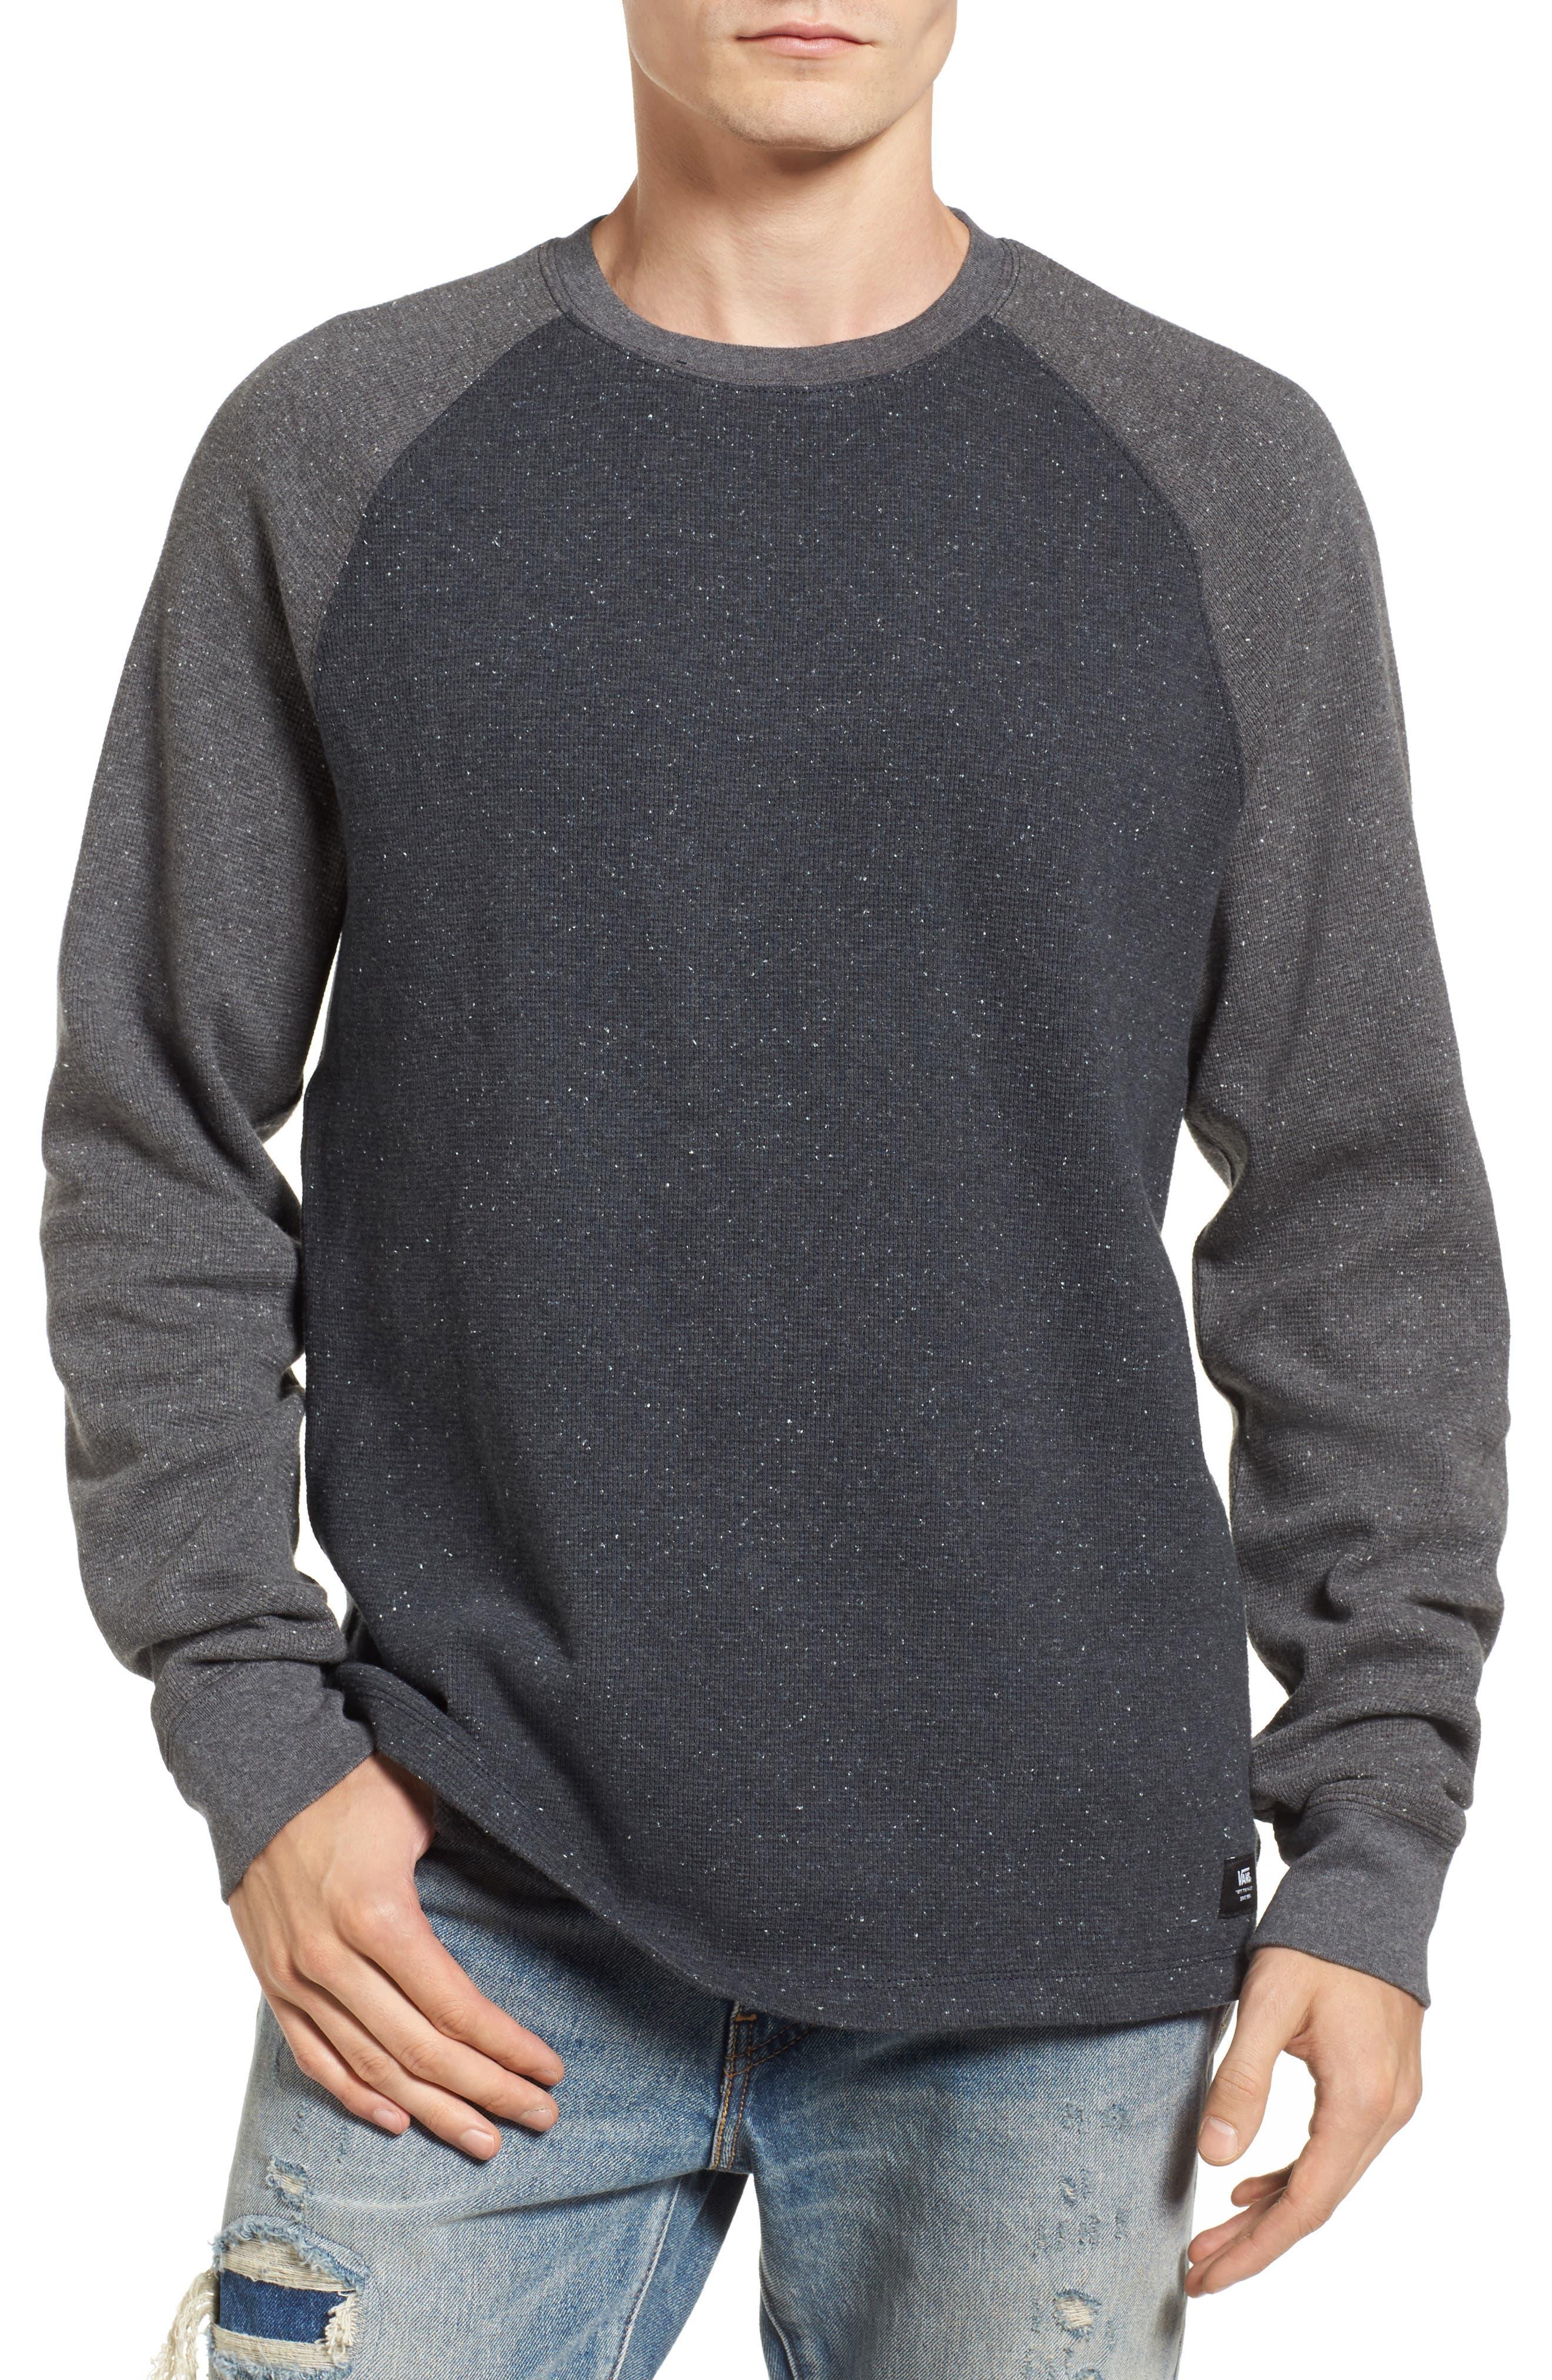 Burdett Thermal T-Shirt,                         Main,                         color, Black Heather